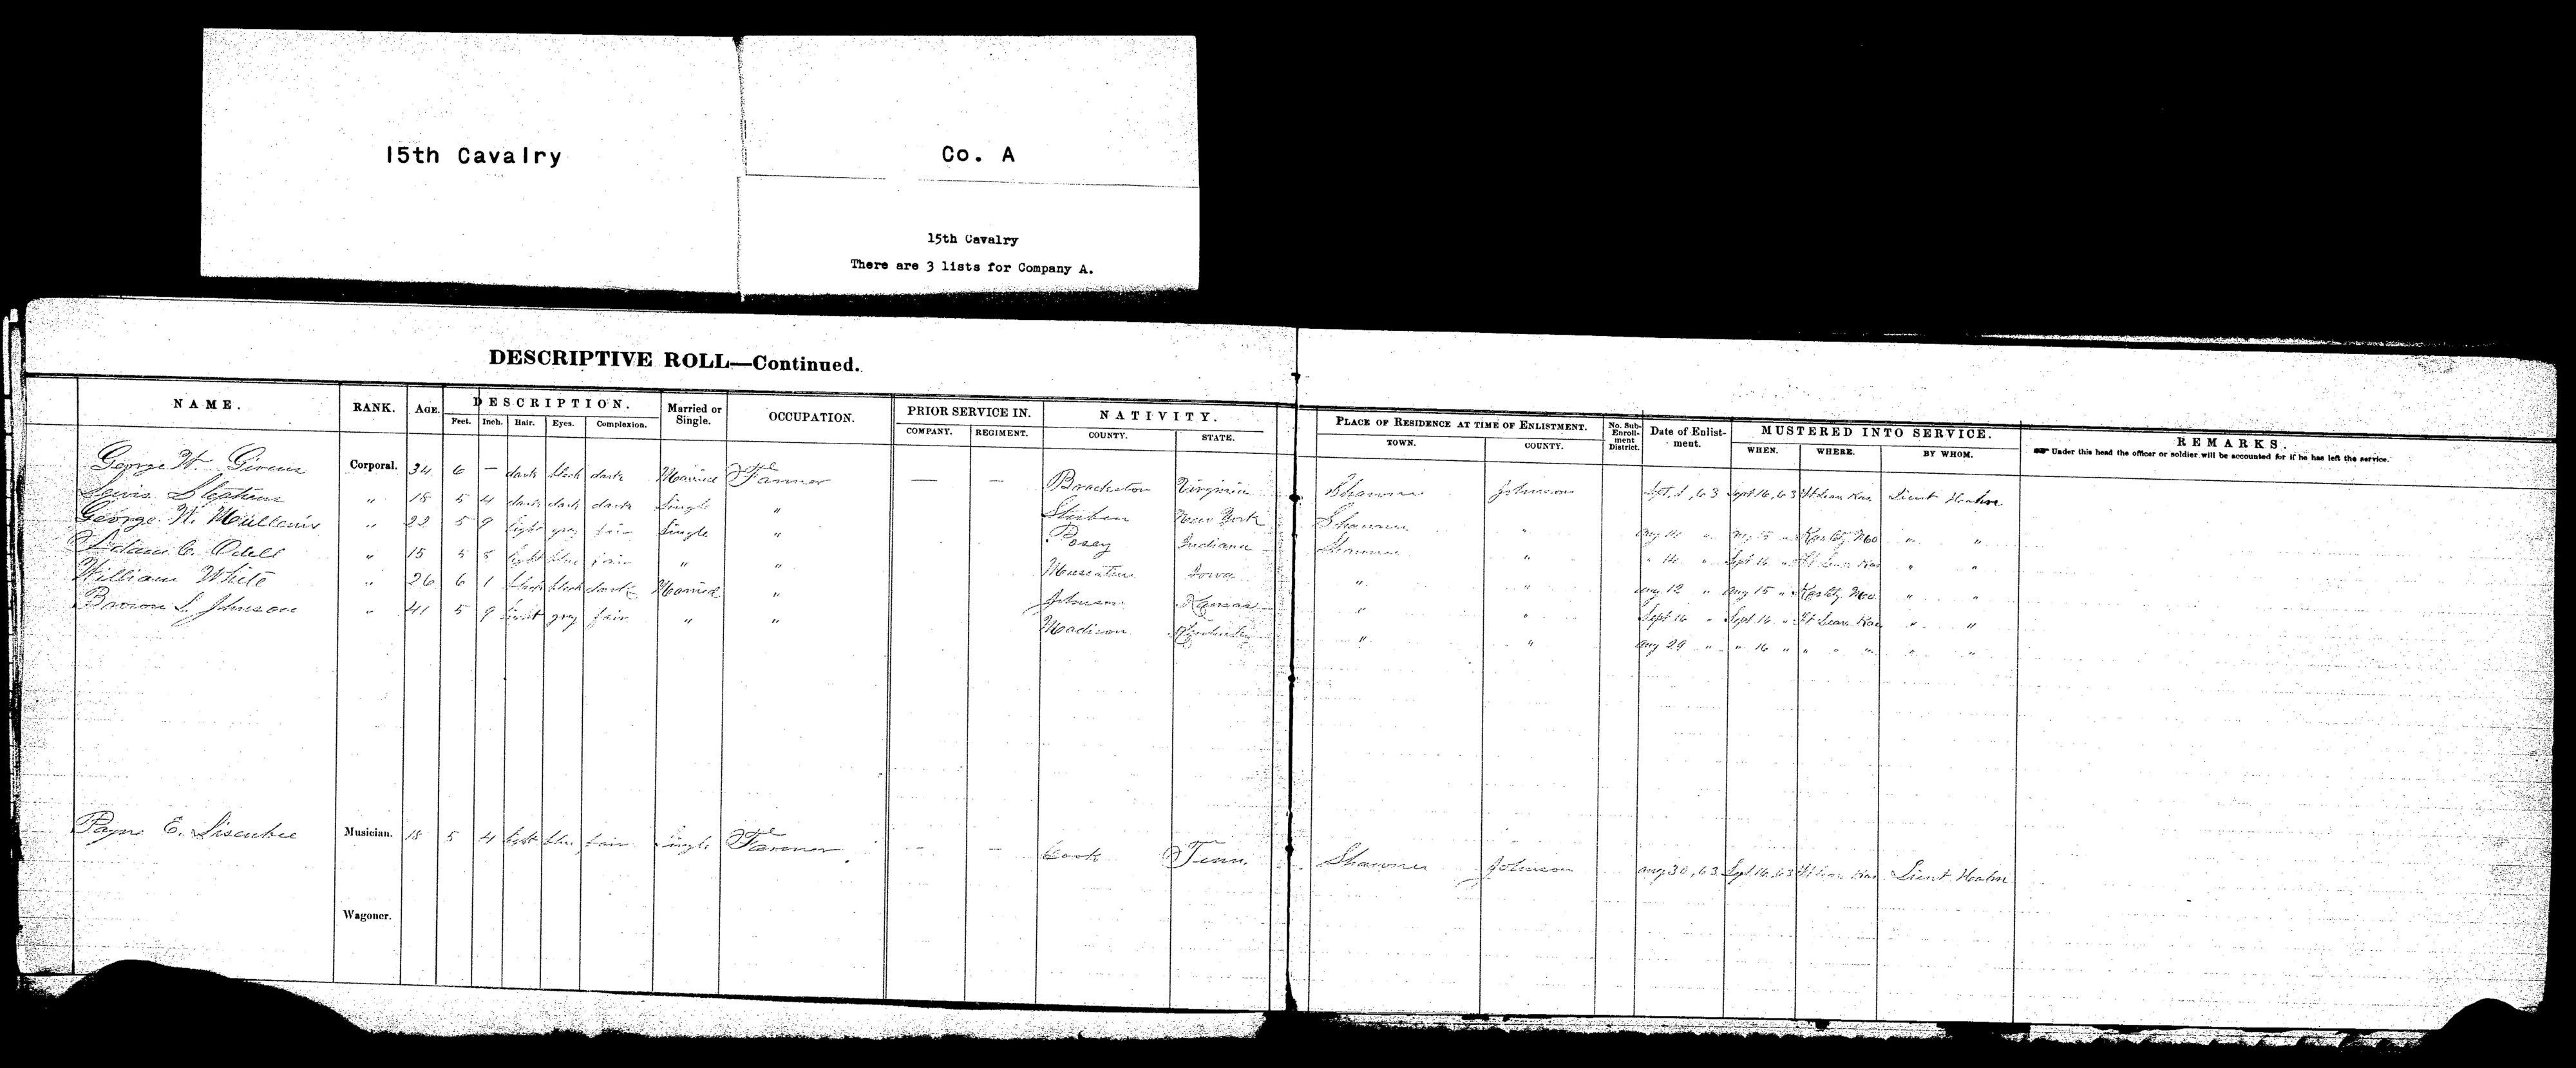 Descriptive roll, Fifteenth Regiment, Cavalry, Kansas Civil War Volunteers, volume 6 - 9